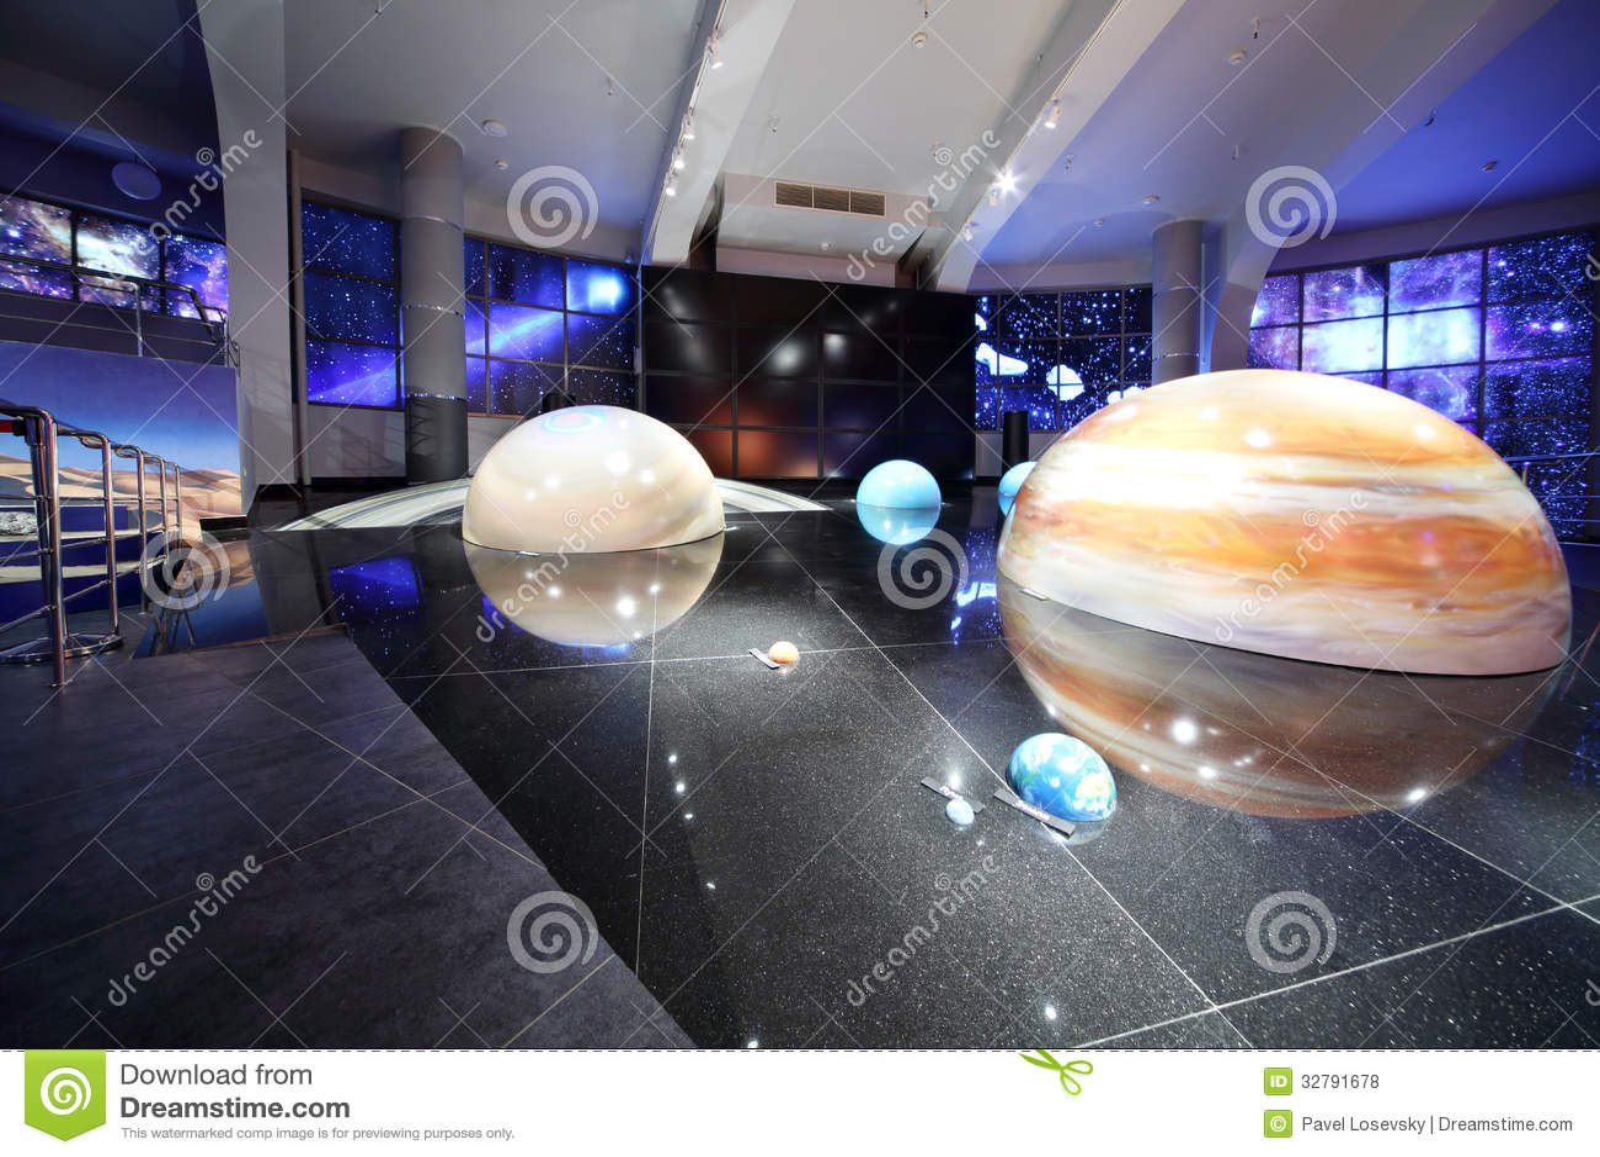 giant solar system model - photo #4